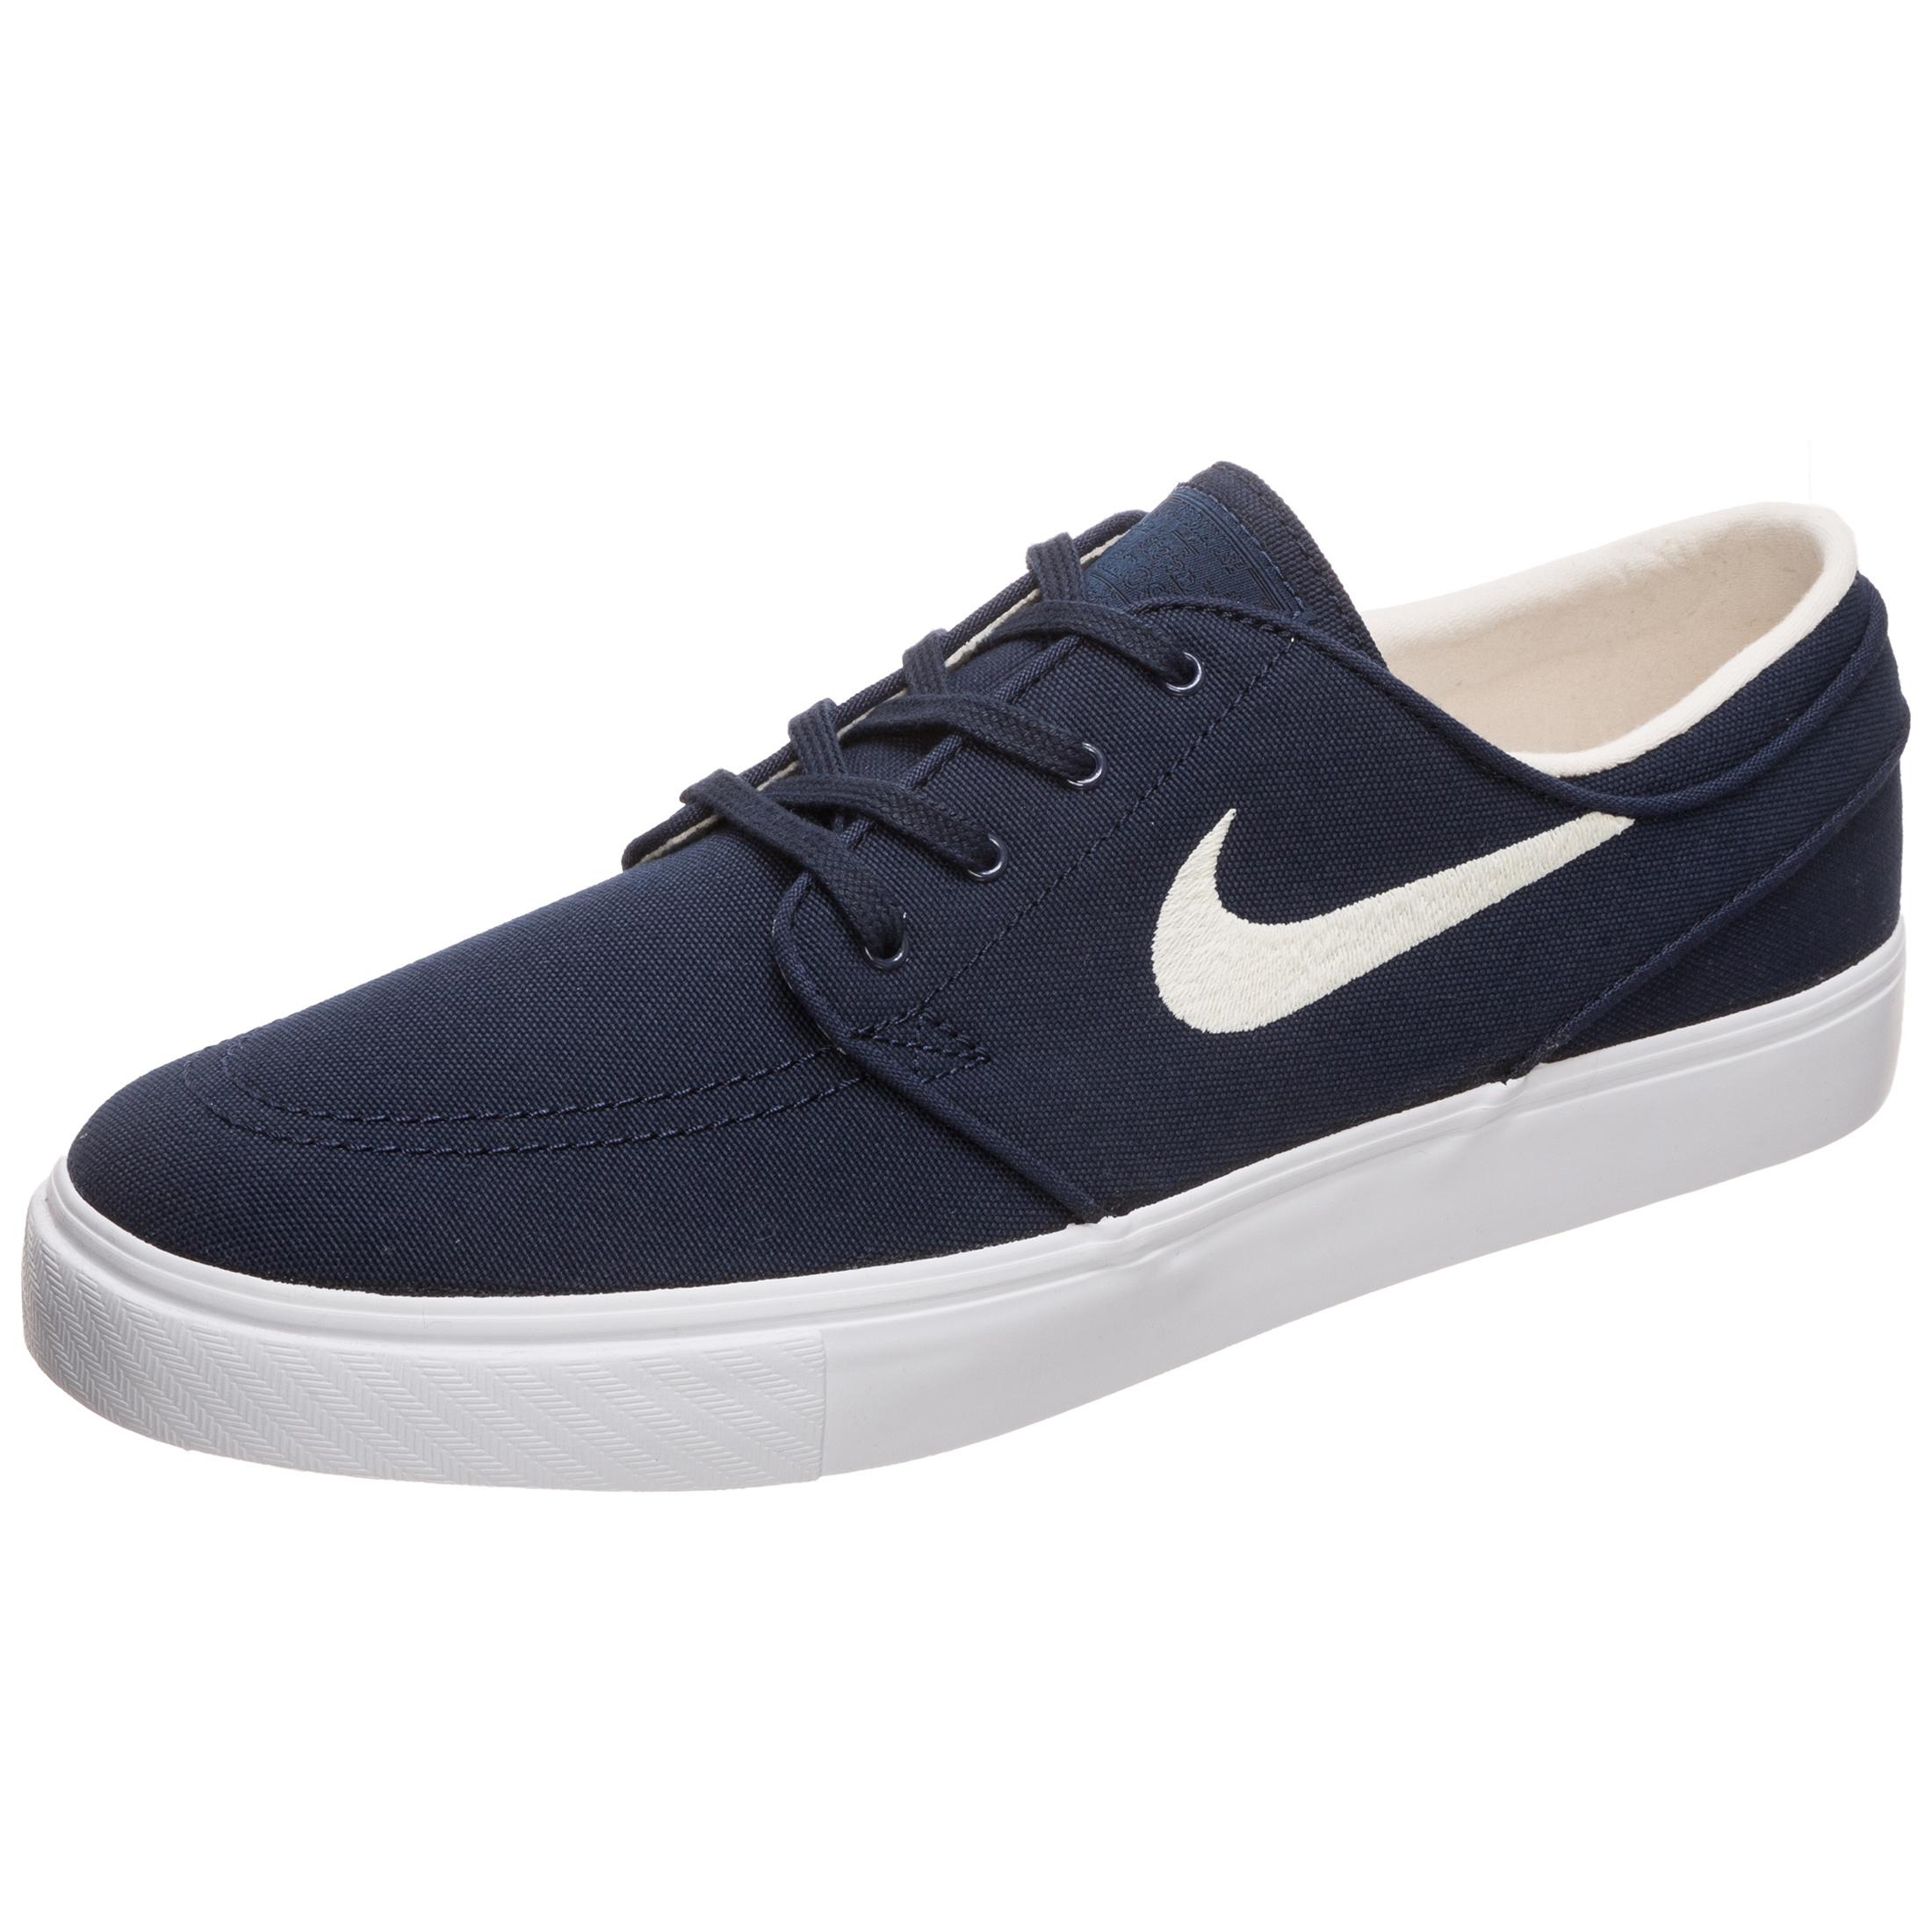 a576c90fa363 Nike SB Zoom Stefan Janoski Canvas Men s Skateboarding Shoe - Blue ...